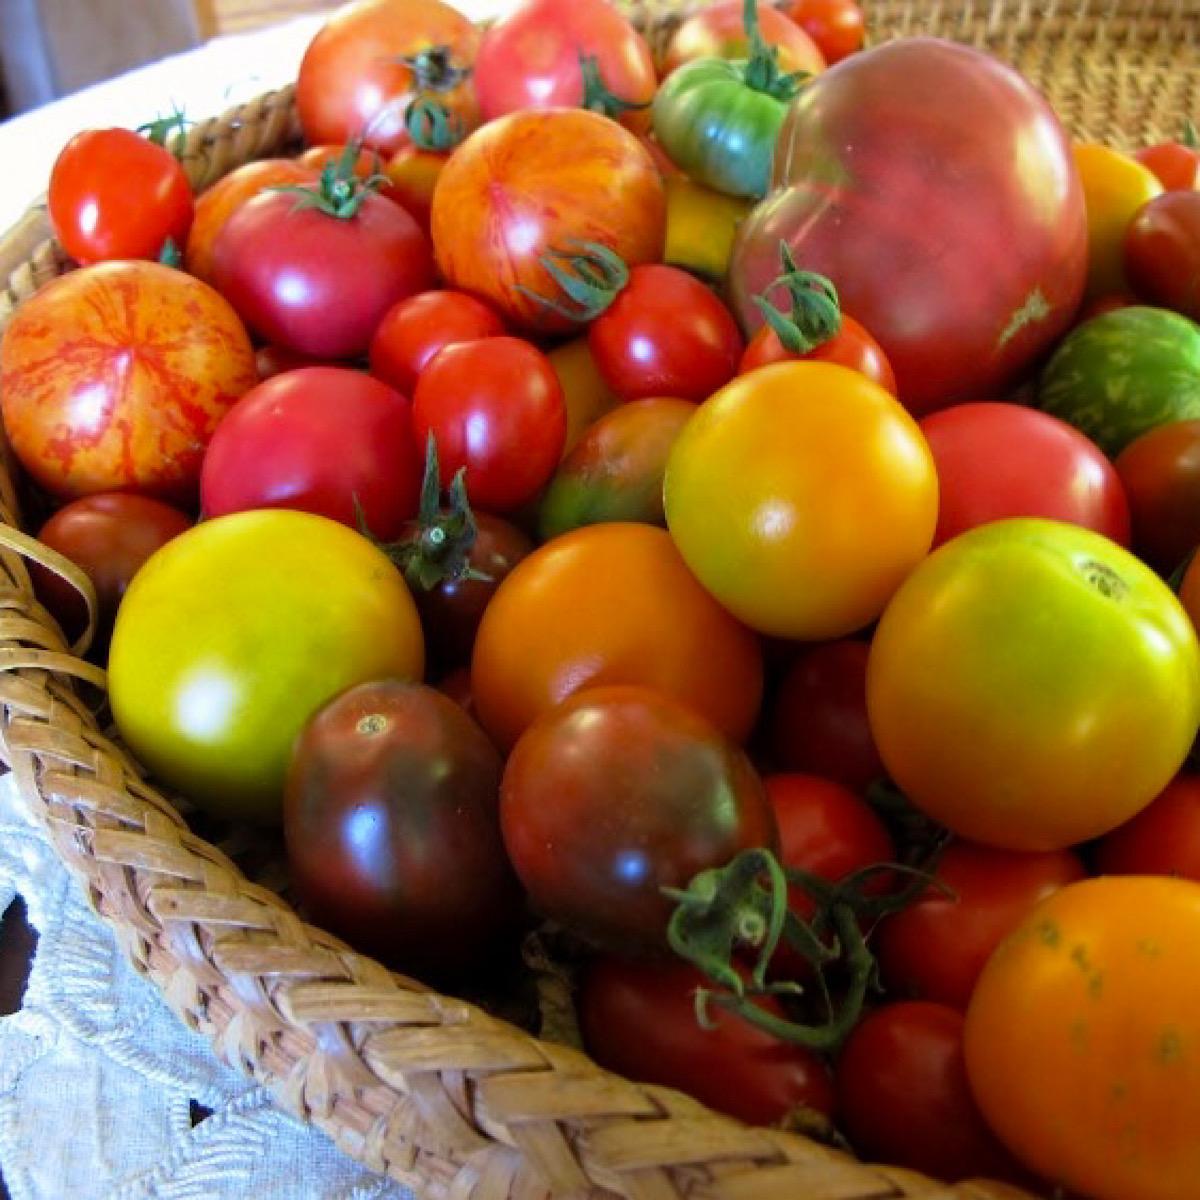 Basket of mixed heirloom tomato varieties